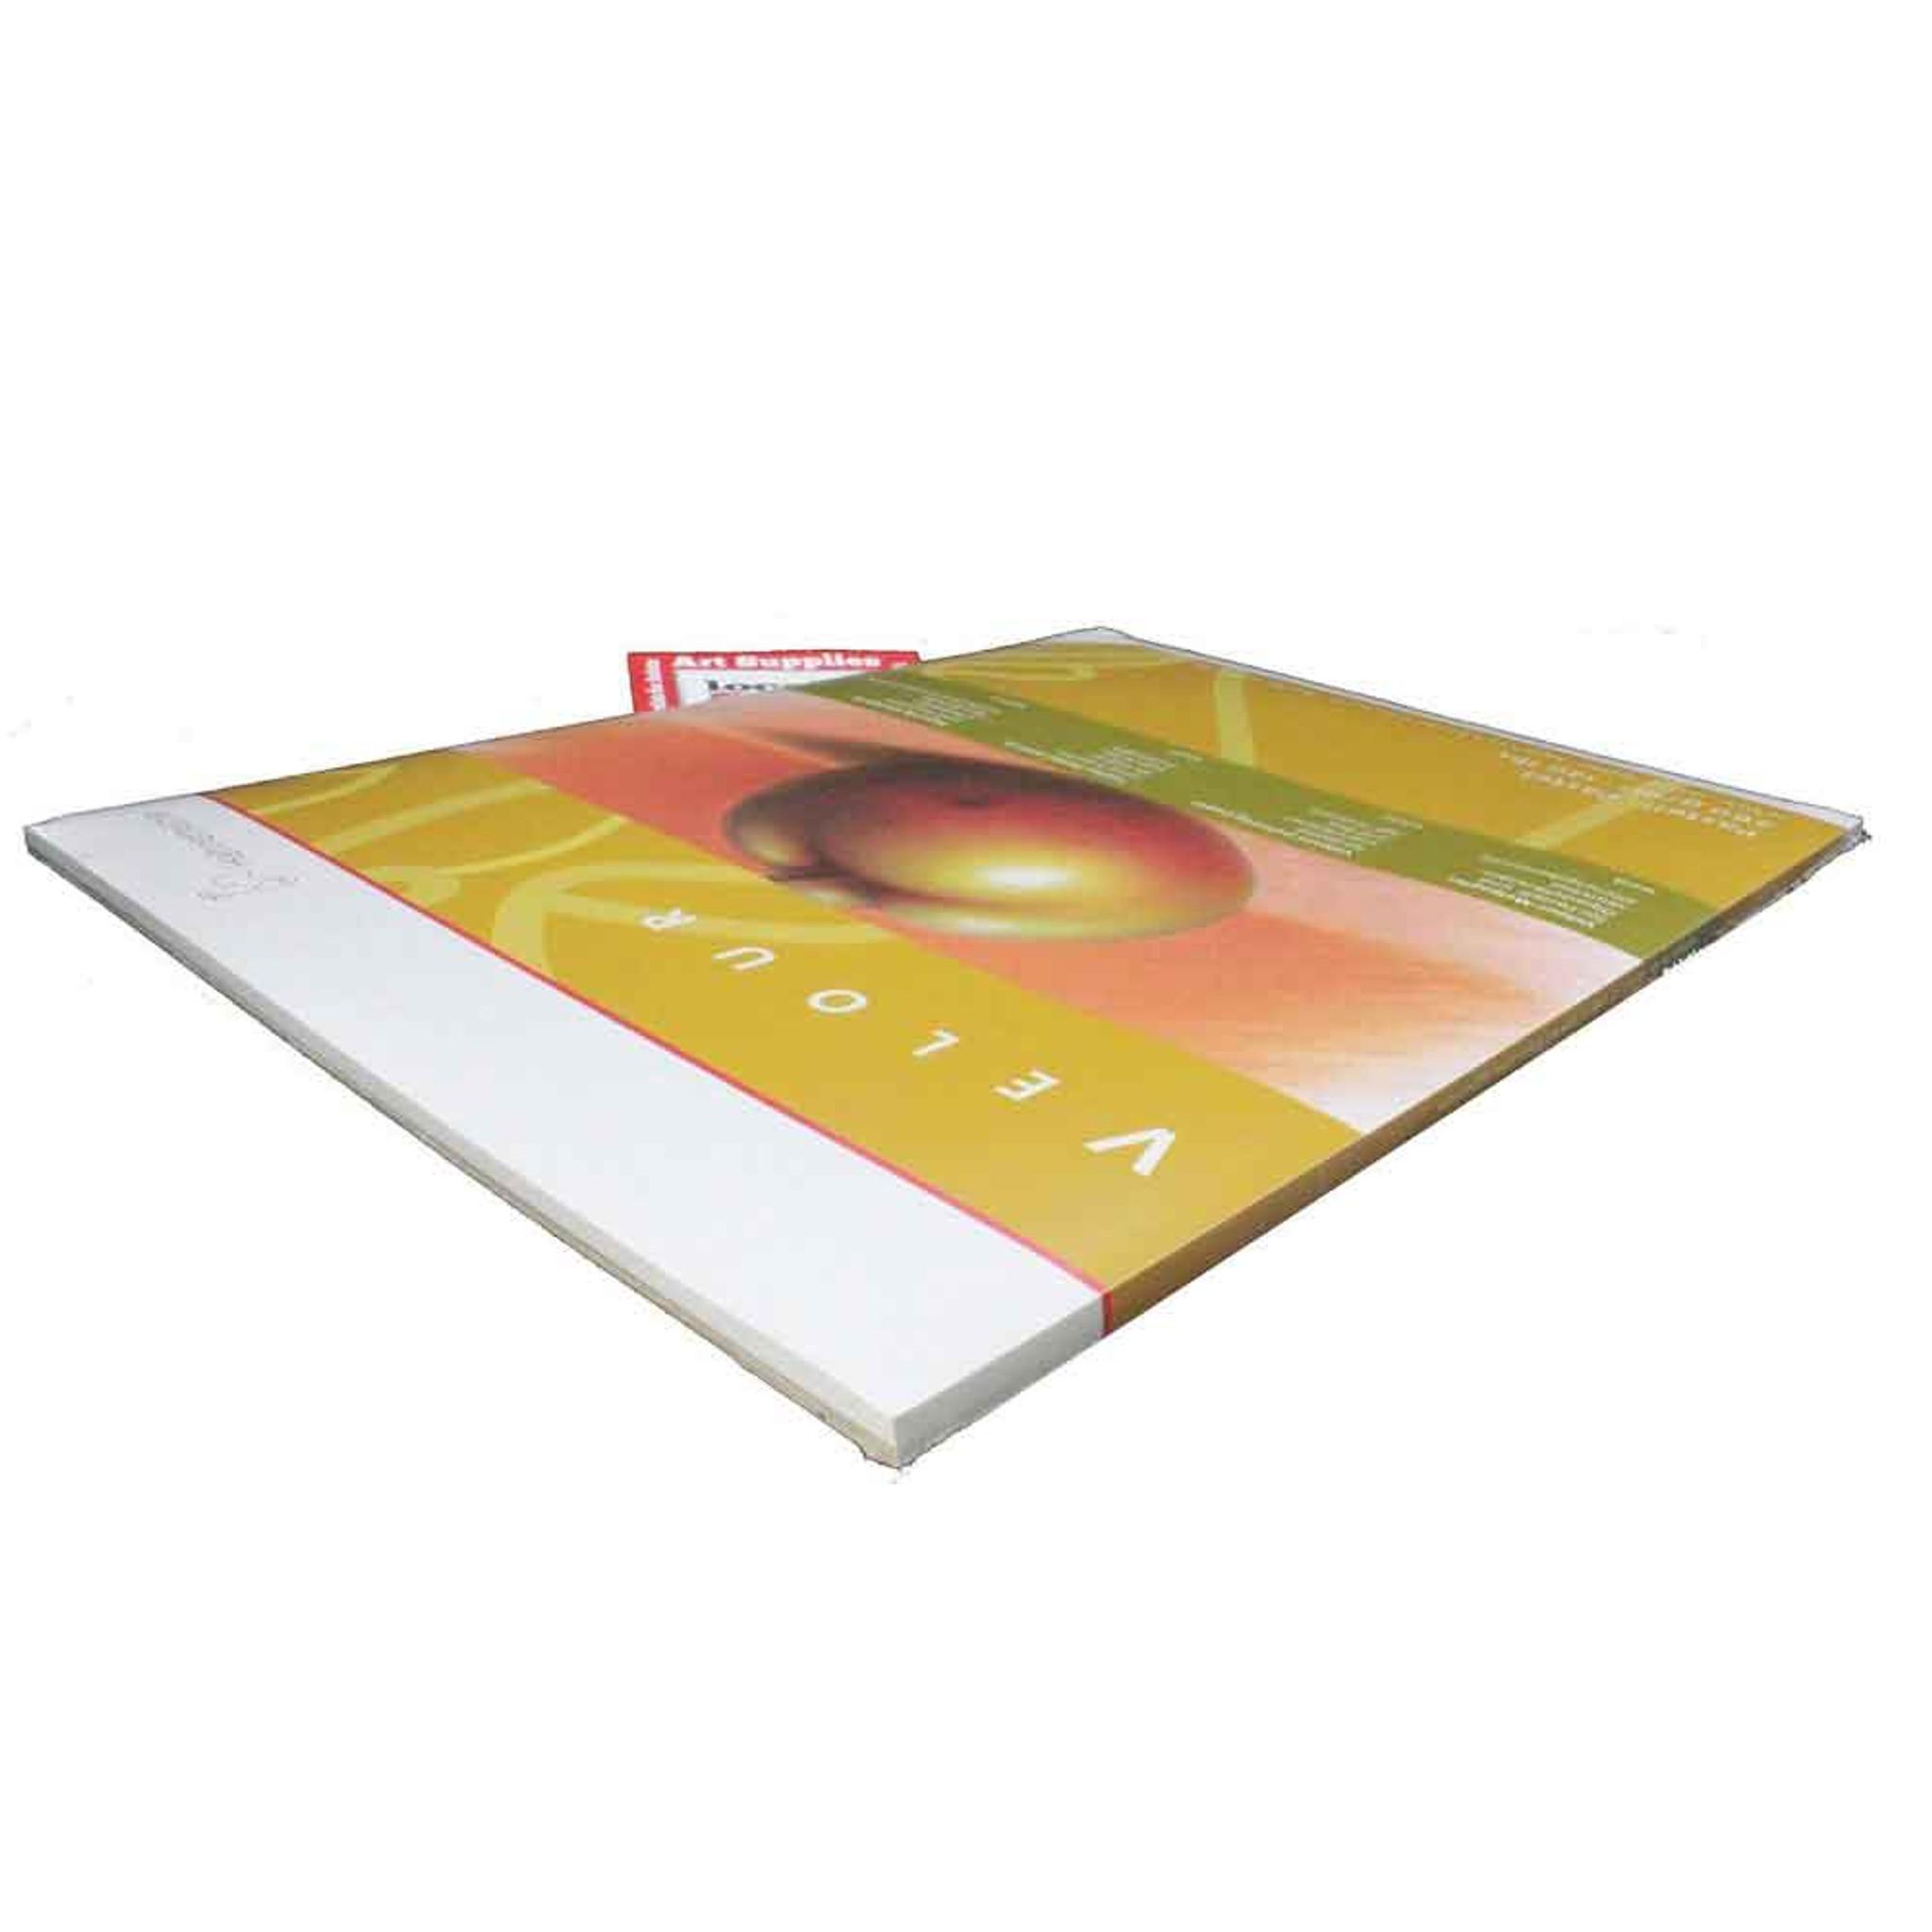 30 x 40 cm Hahnemuhle velours PASTEL papier Pad-Blanc